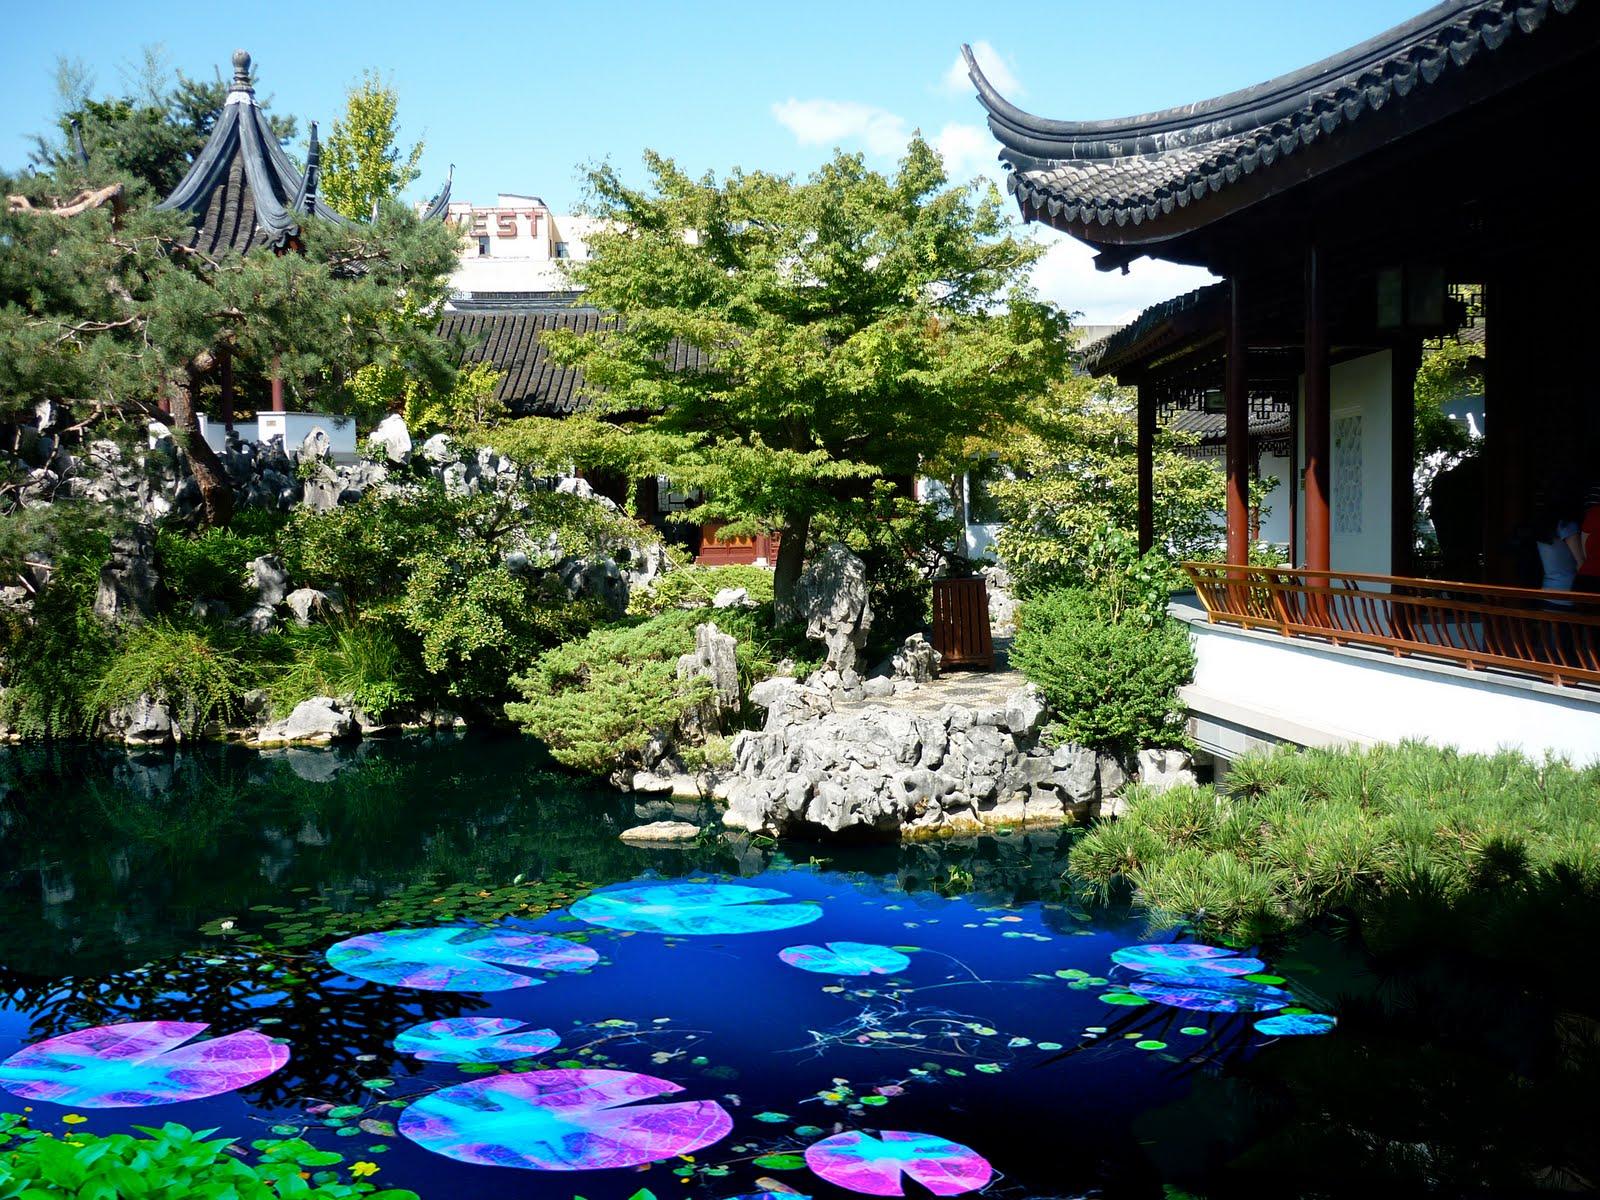 Lotus In Motion The Watercolour Project Dr Sun Yat Sen